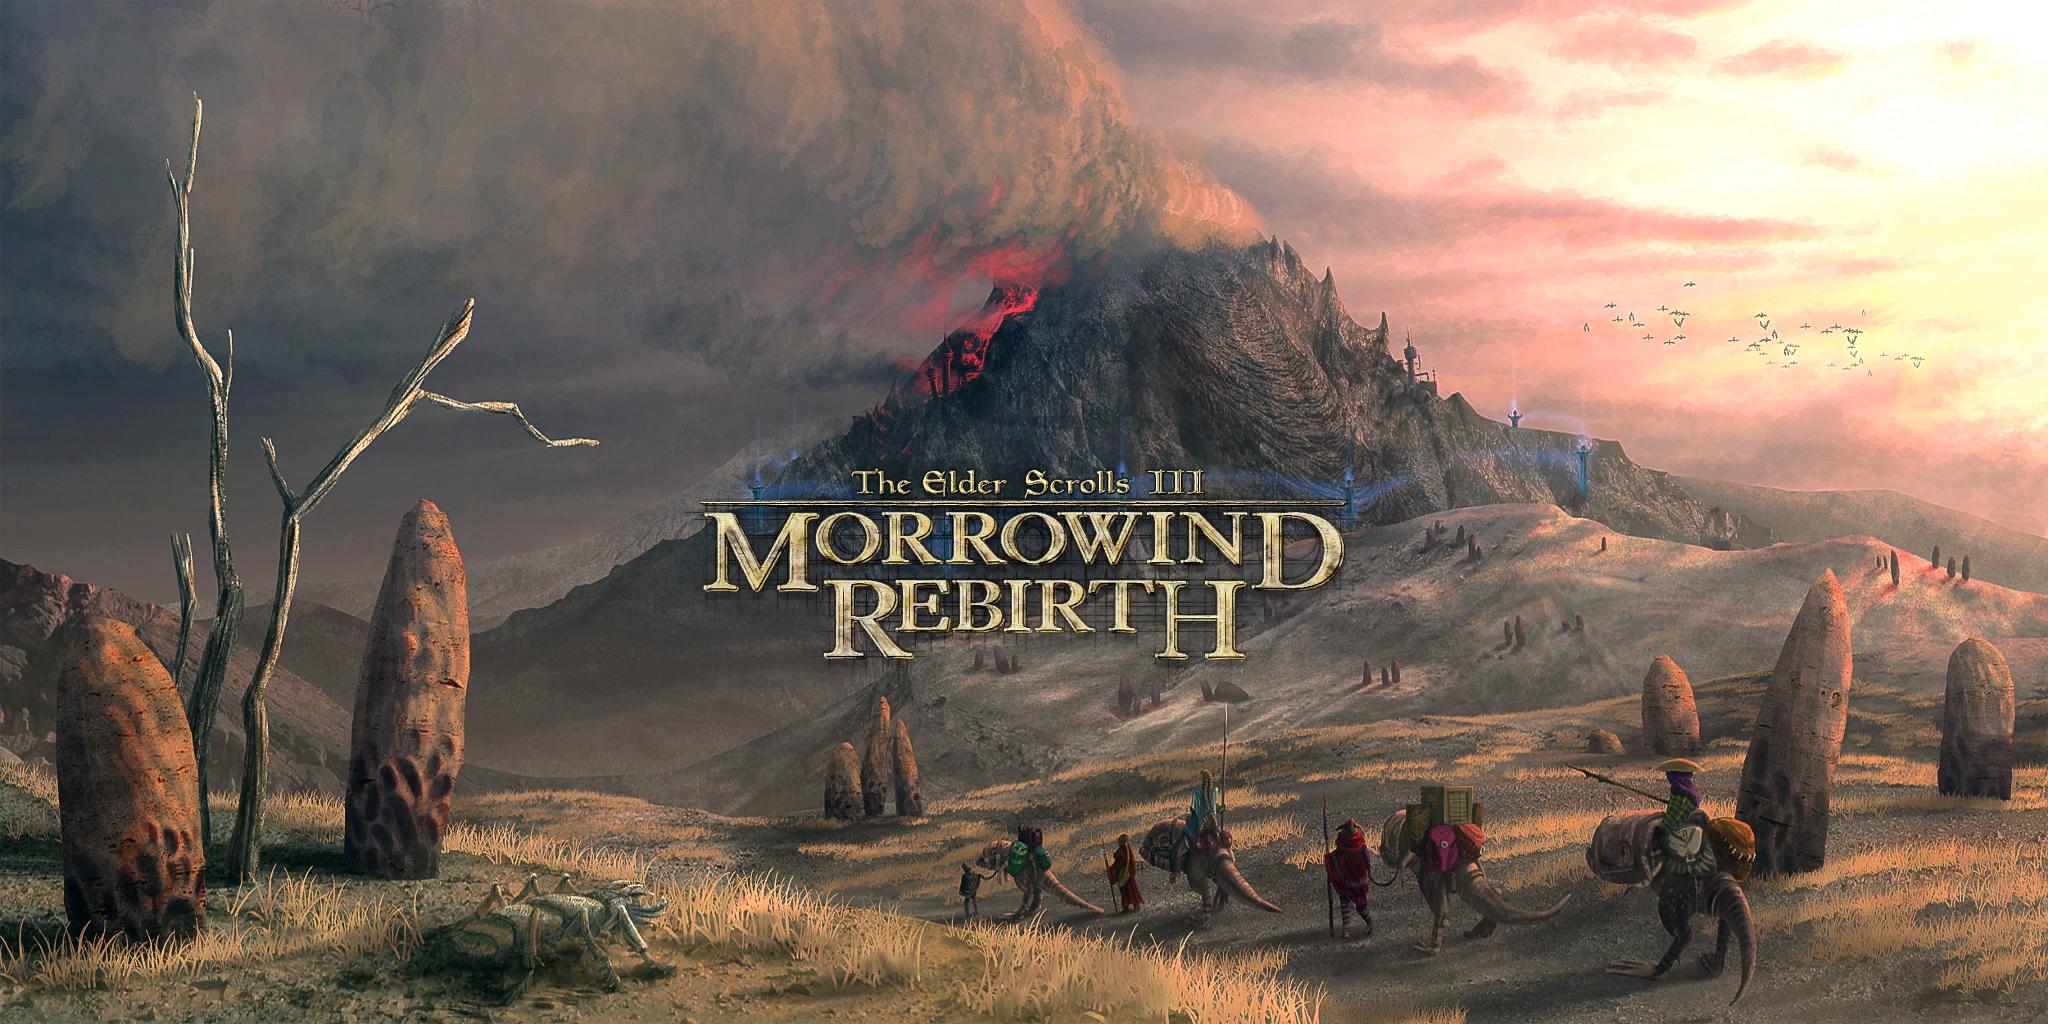 Oblivion rebirth free download - 38d